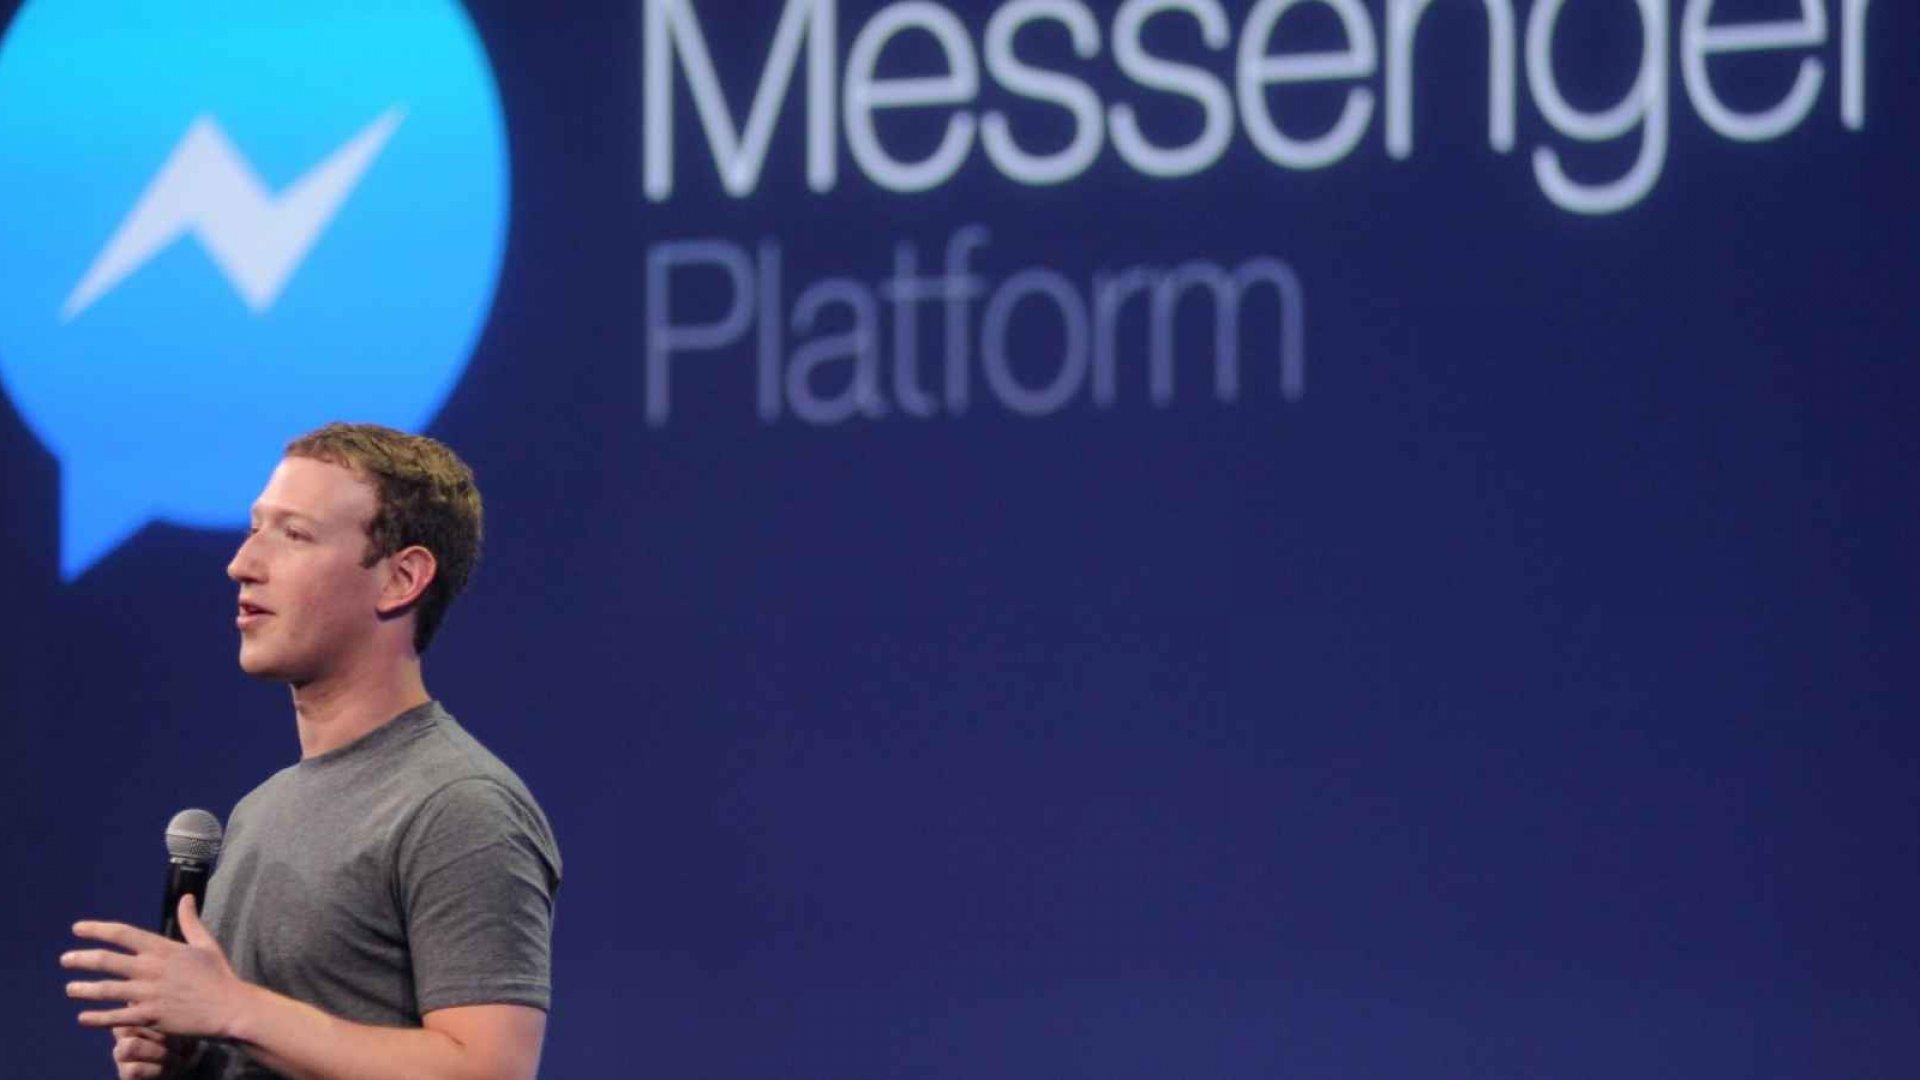 Facebook Messenger Surpasses 1 Billion in Users